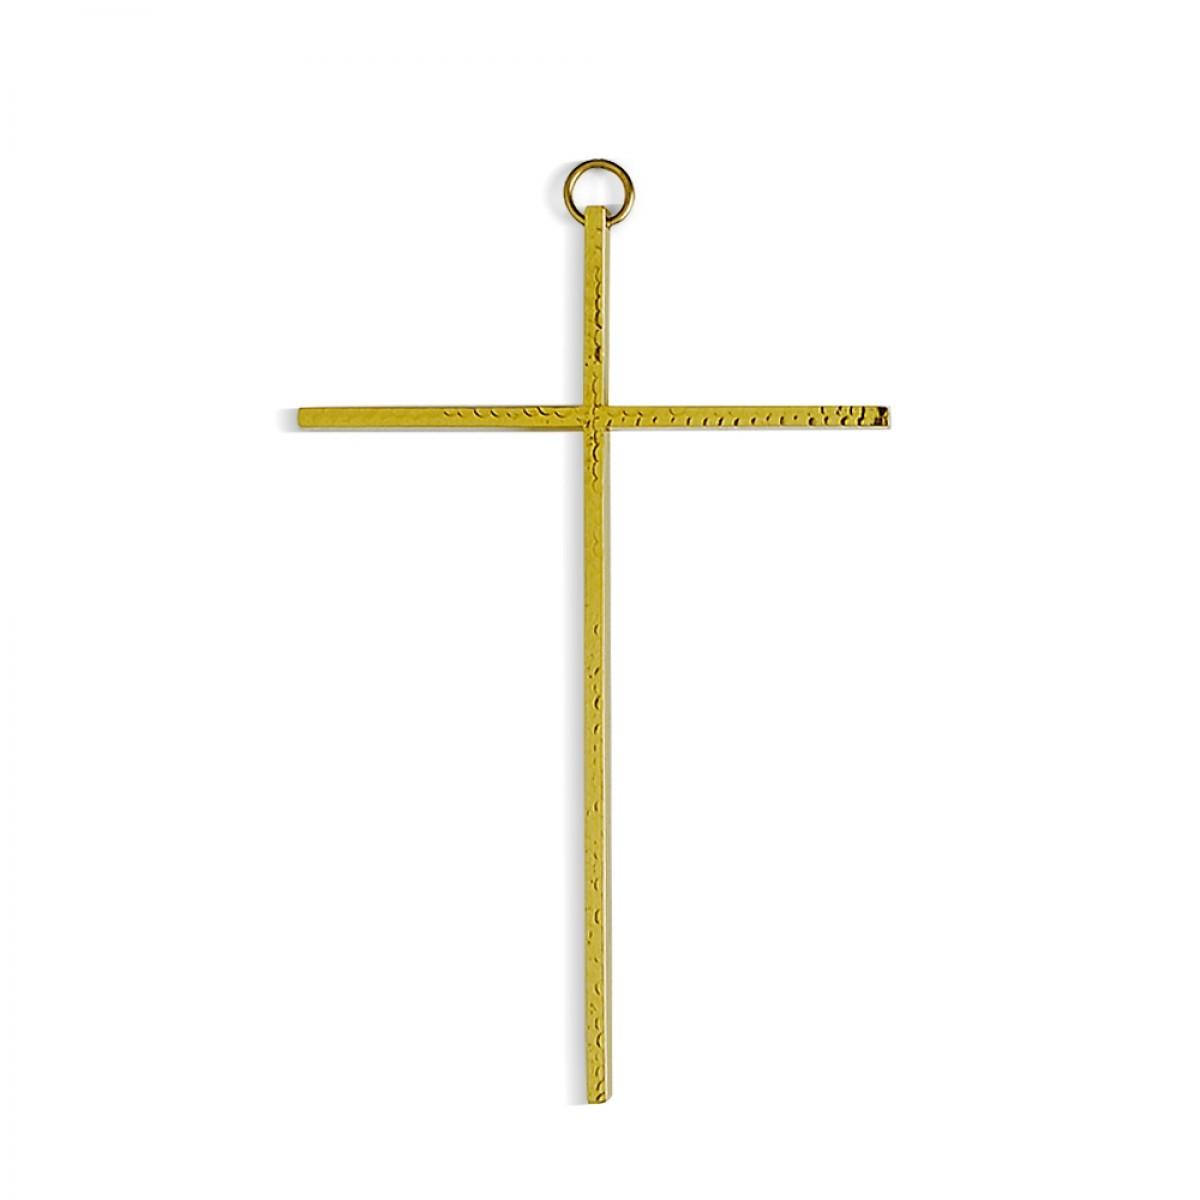 Croce da appendere martellata - art. C. N 12 M - finitura dorata